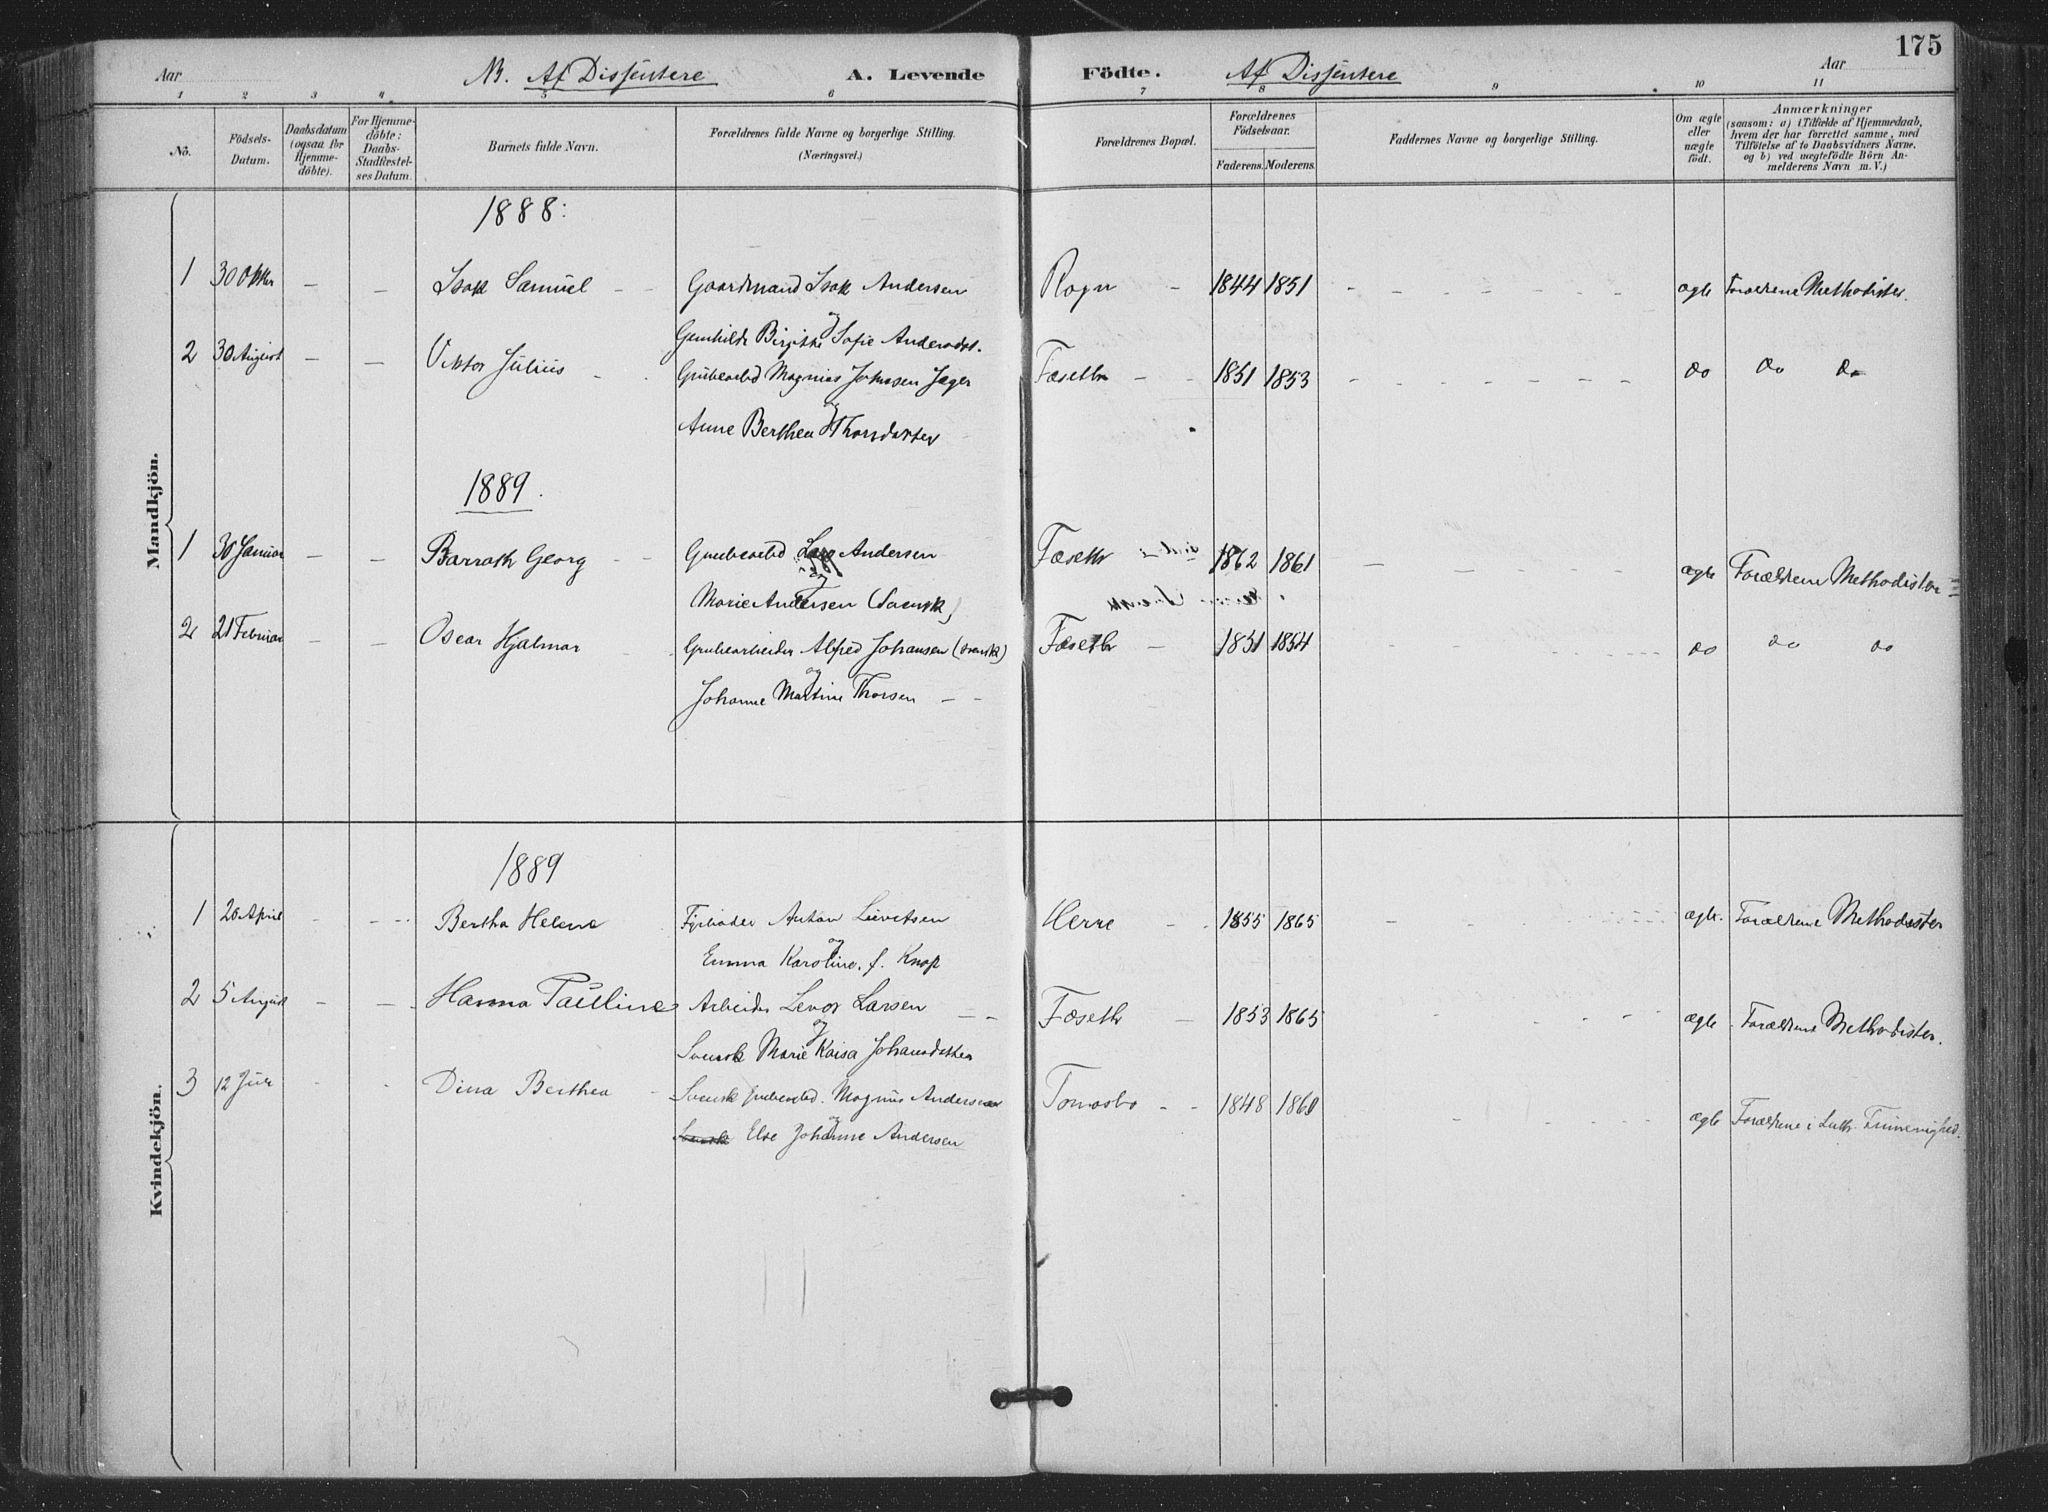 SAKO, Bamble kirkebøker, F/Fa/L0008: Ministerialbok nr. I 8, 1888-1900, s. 175